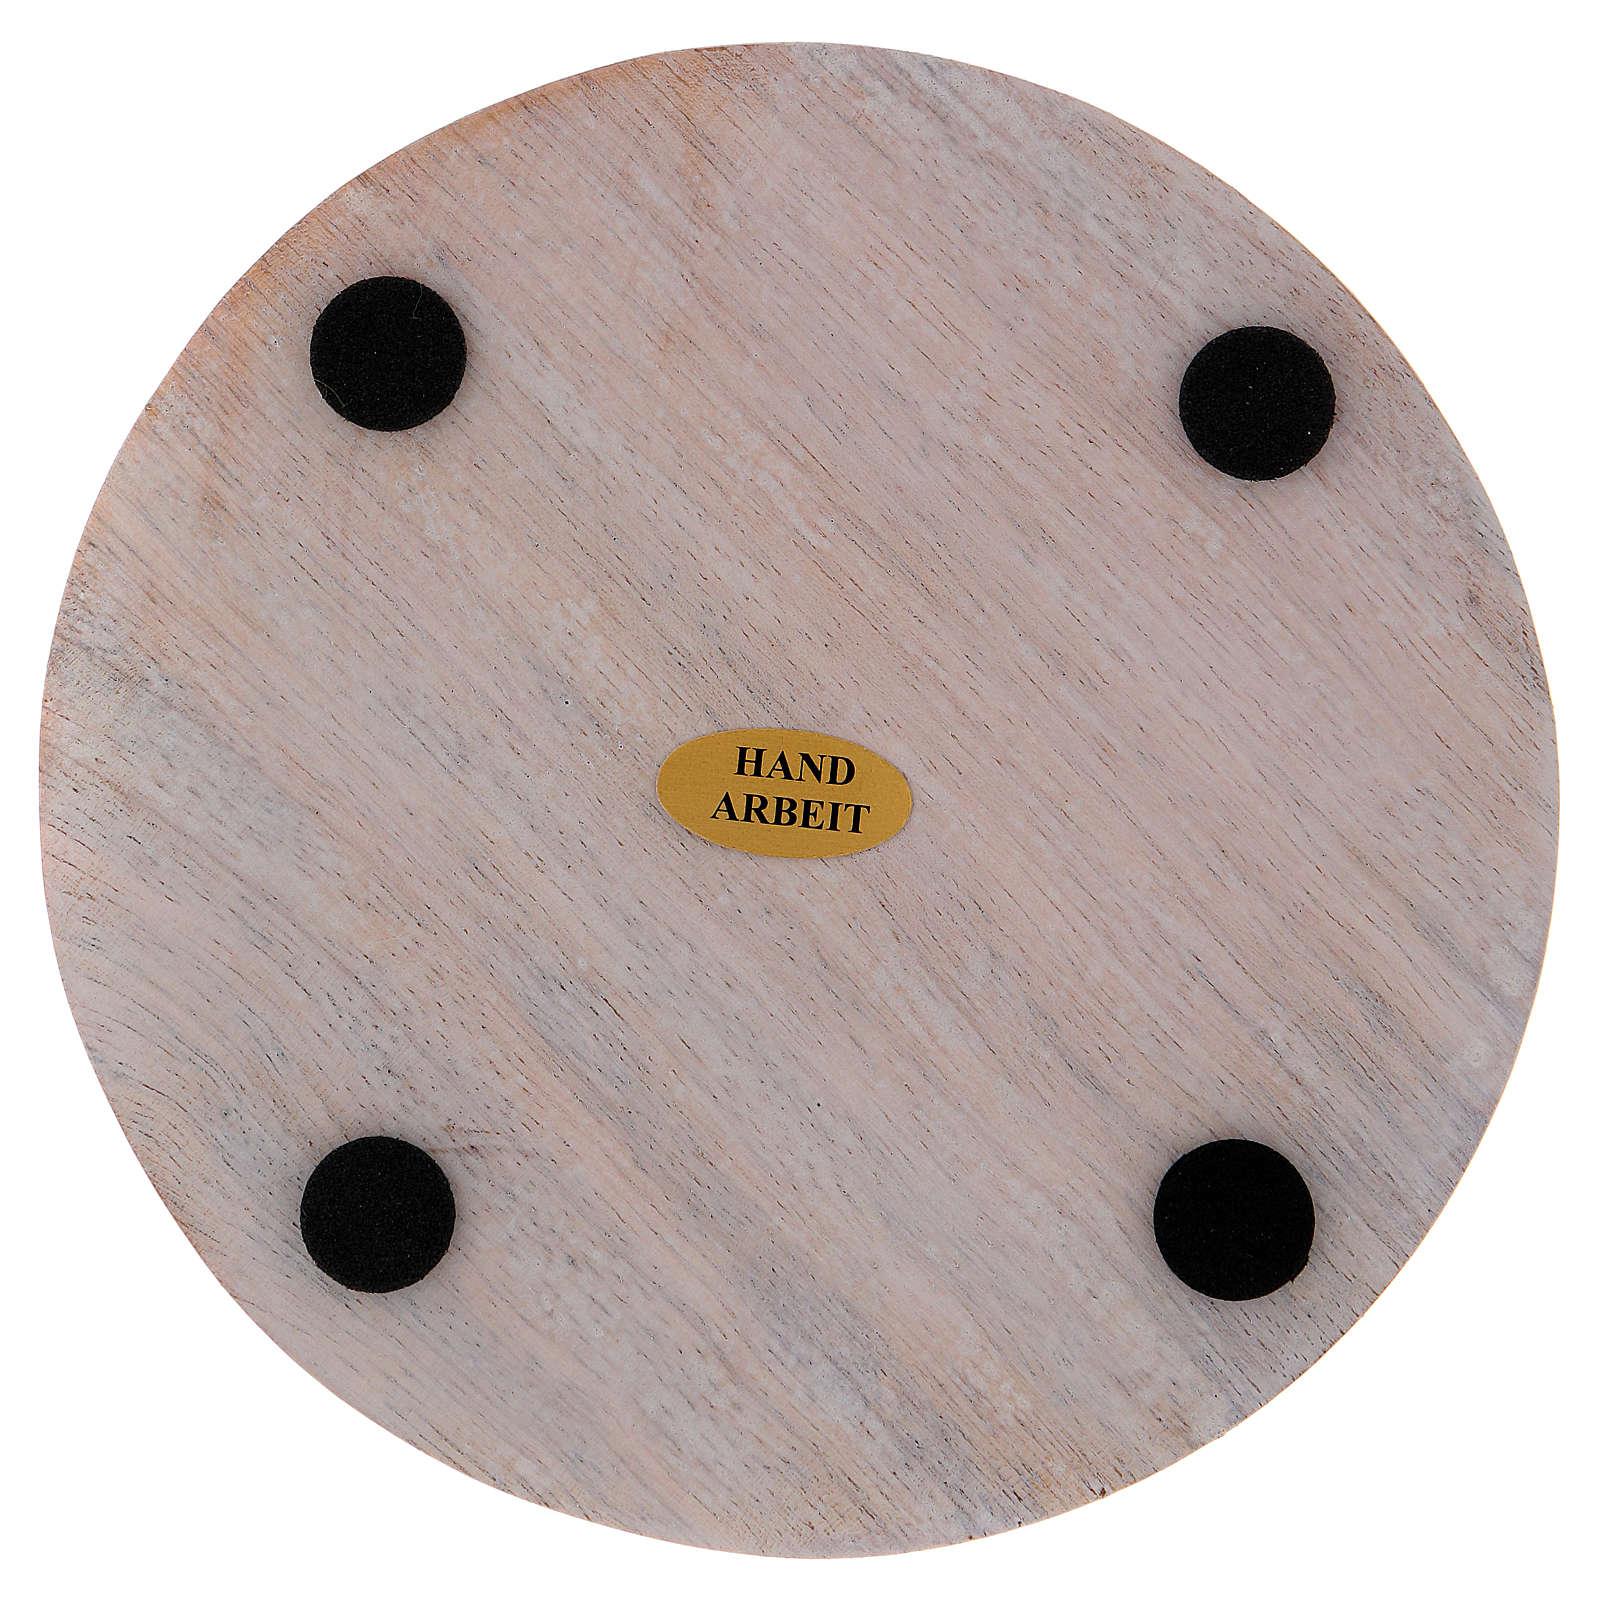 Piatto portacandele legno dipinto 12 cm 3